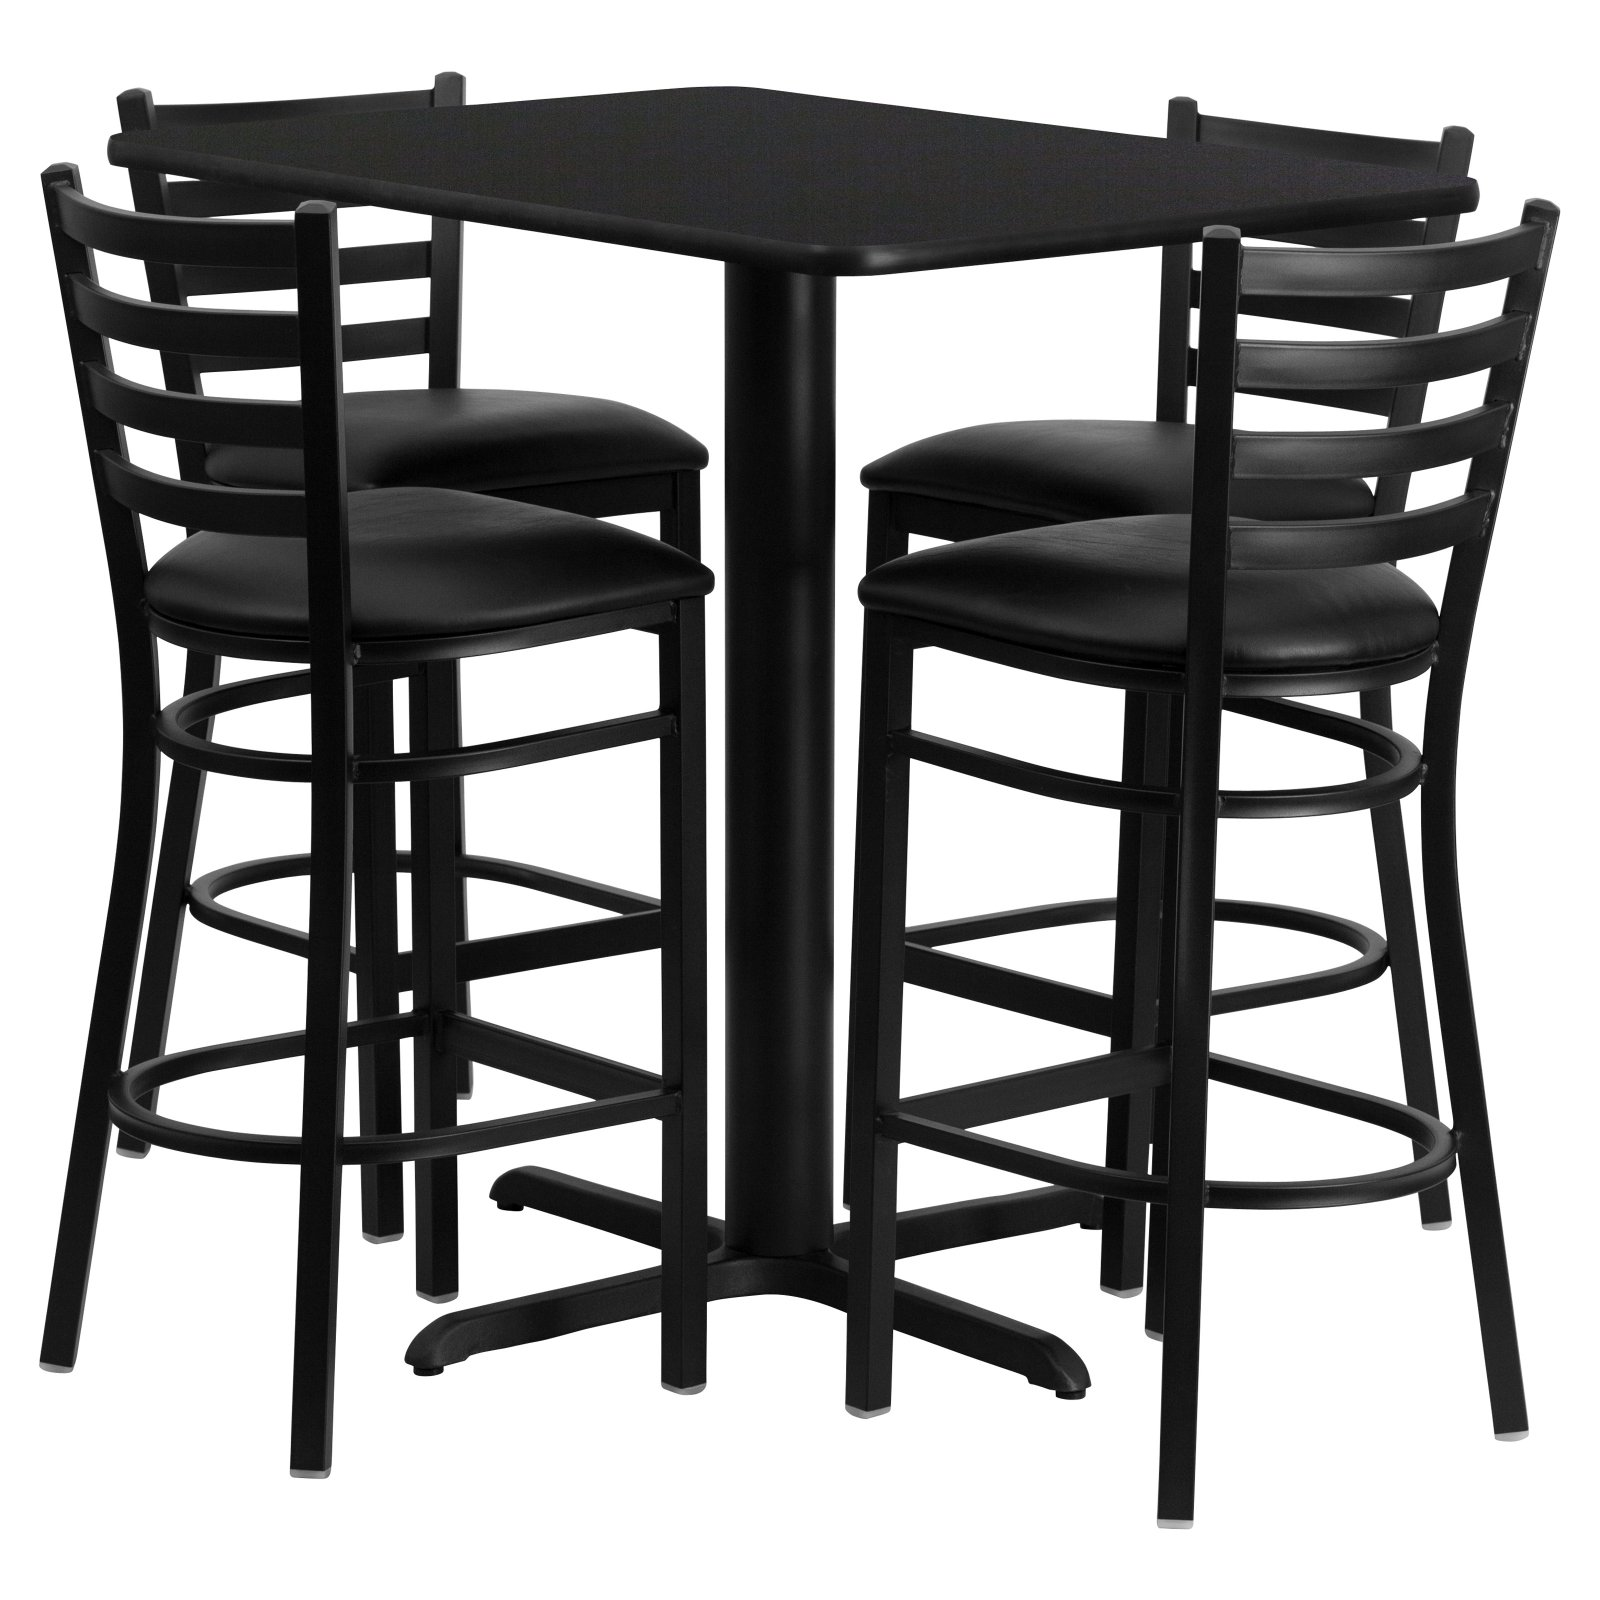 Flash Furniture 24''W x 42''L Rectangular Black Laminate Table Set with 4 Ladder Back Metal Barstools, Black Vinyl Seat Black